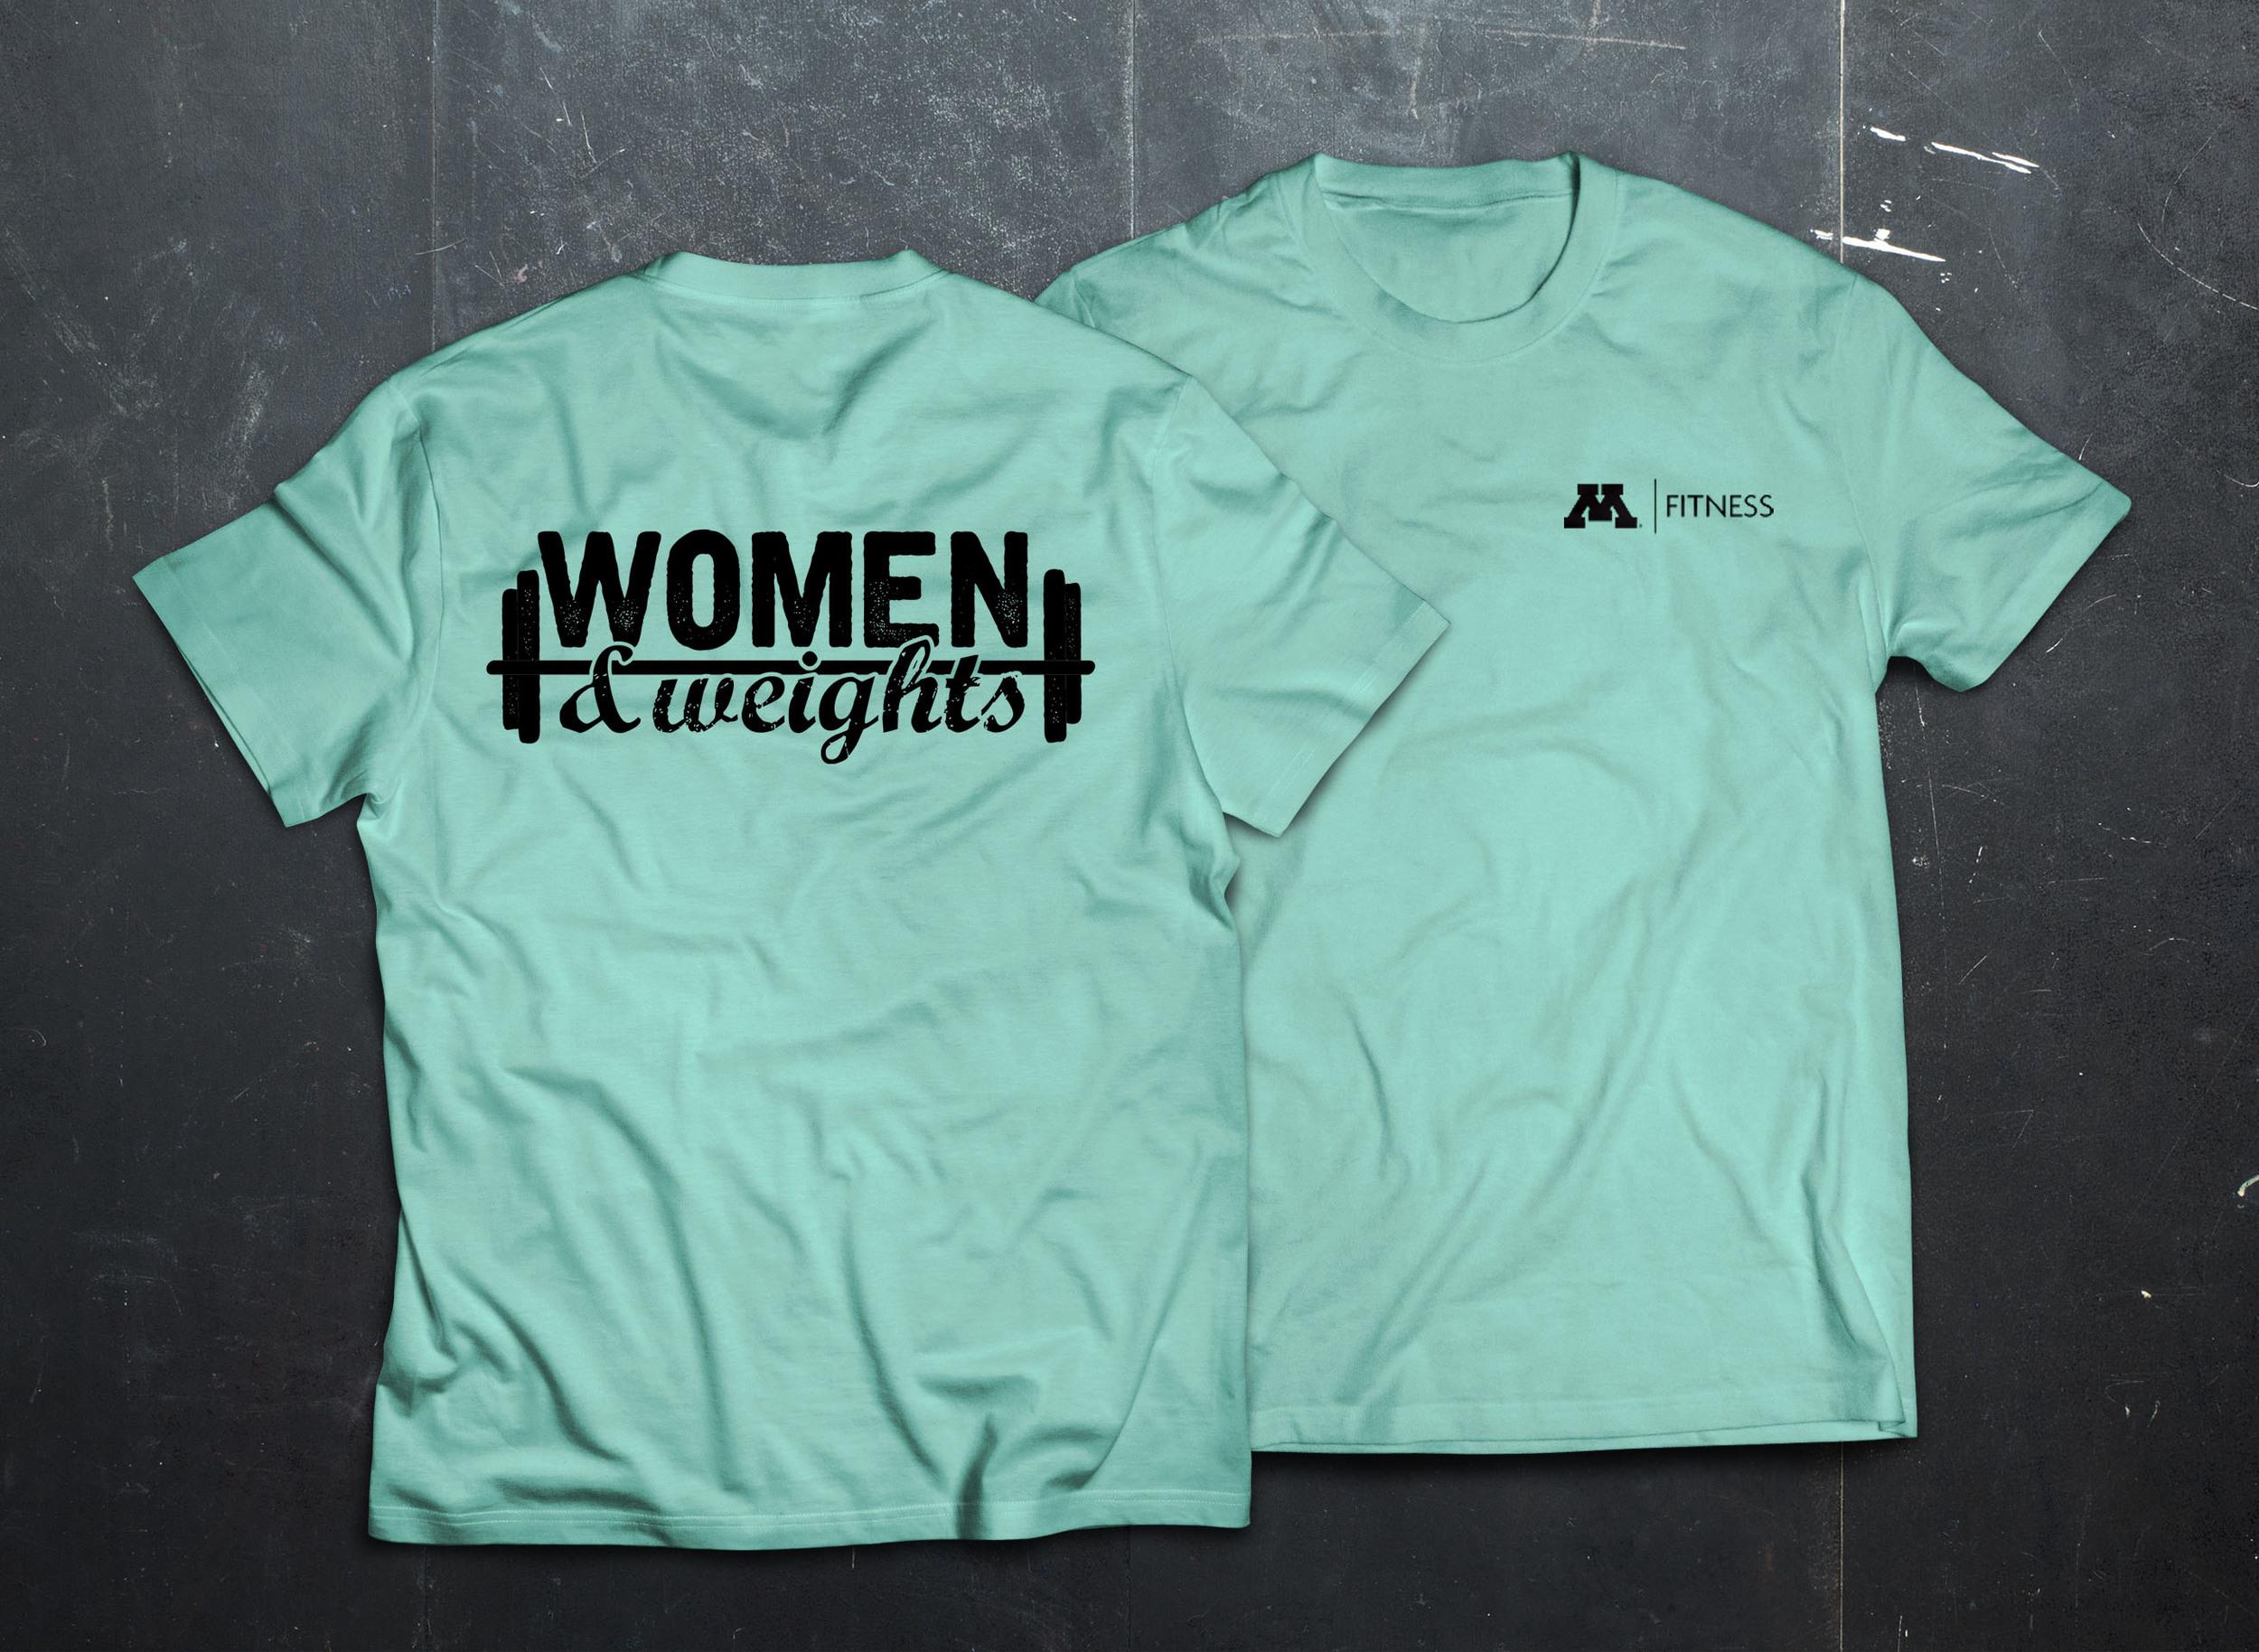 WW T-Shirt MockUp.jpg